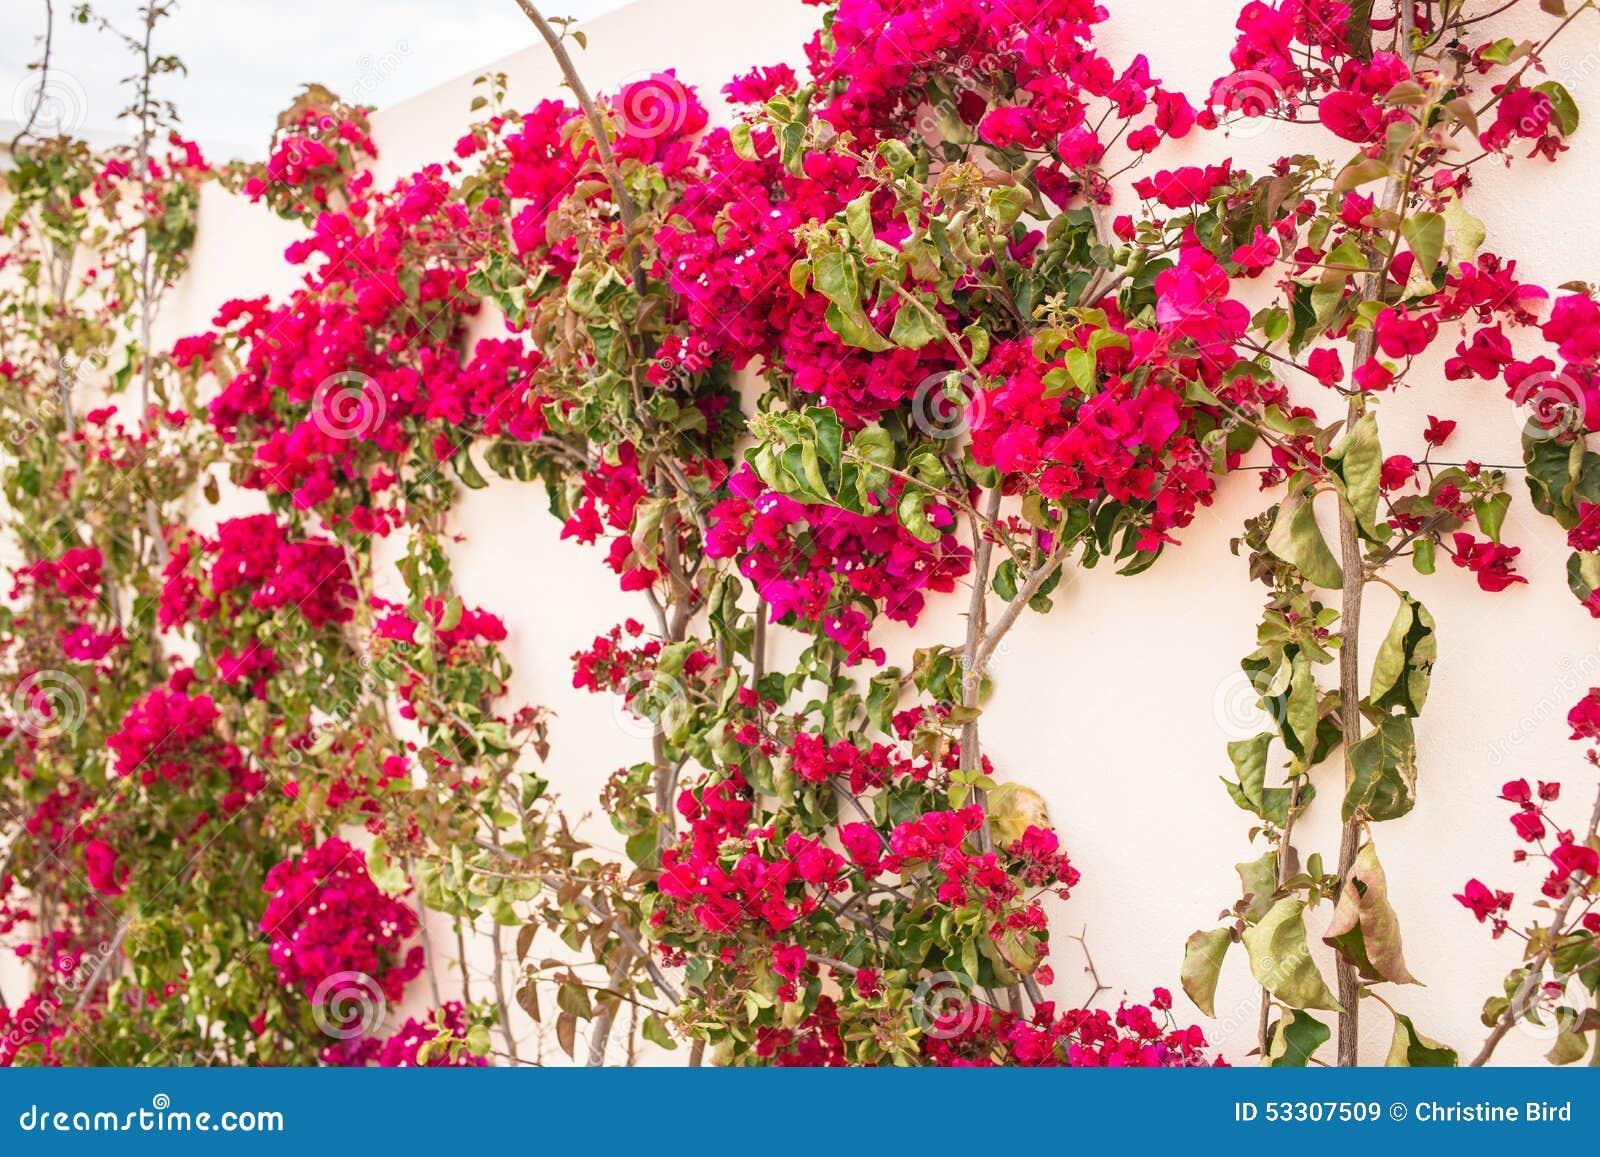 Letter K Pictures Images amp Photos  Photobucket